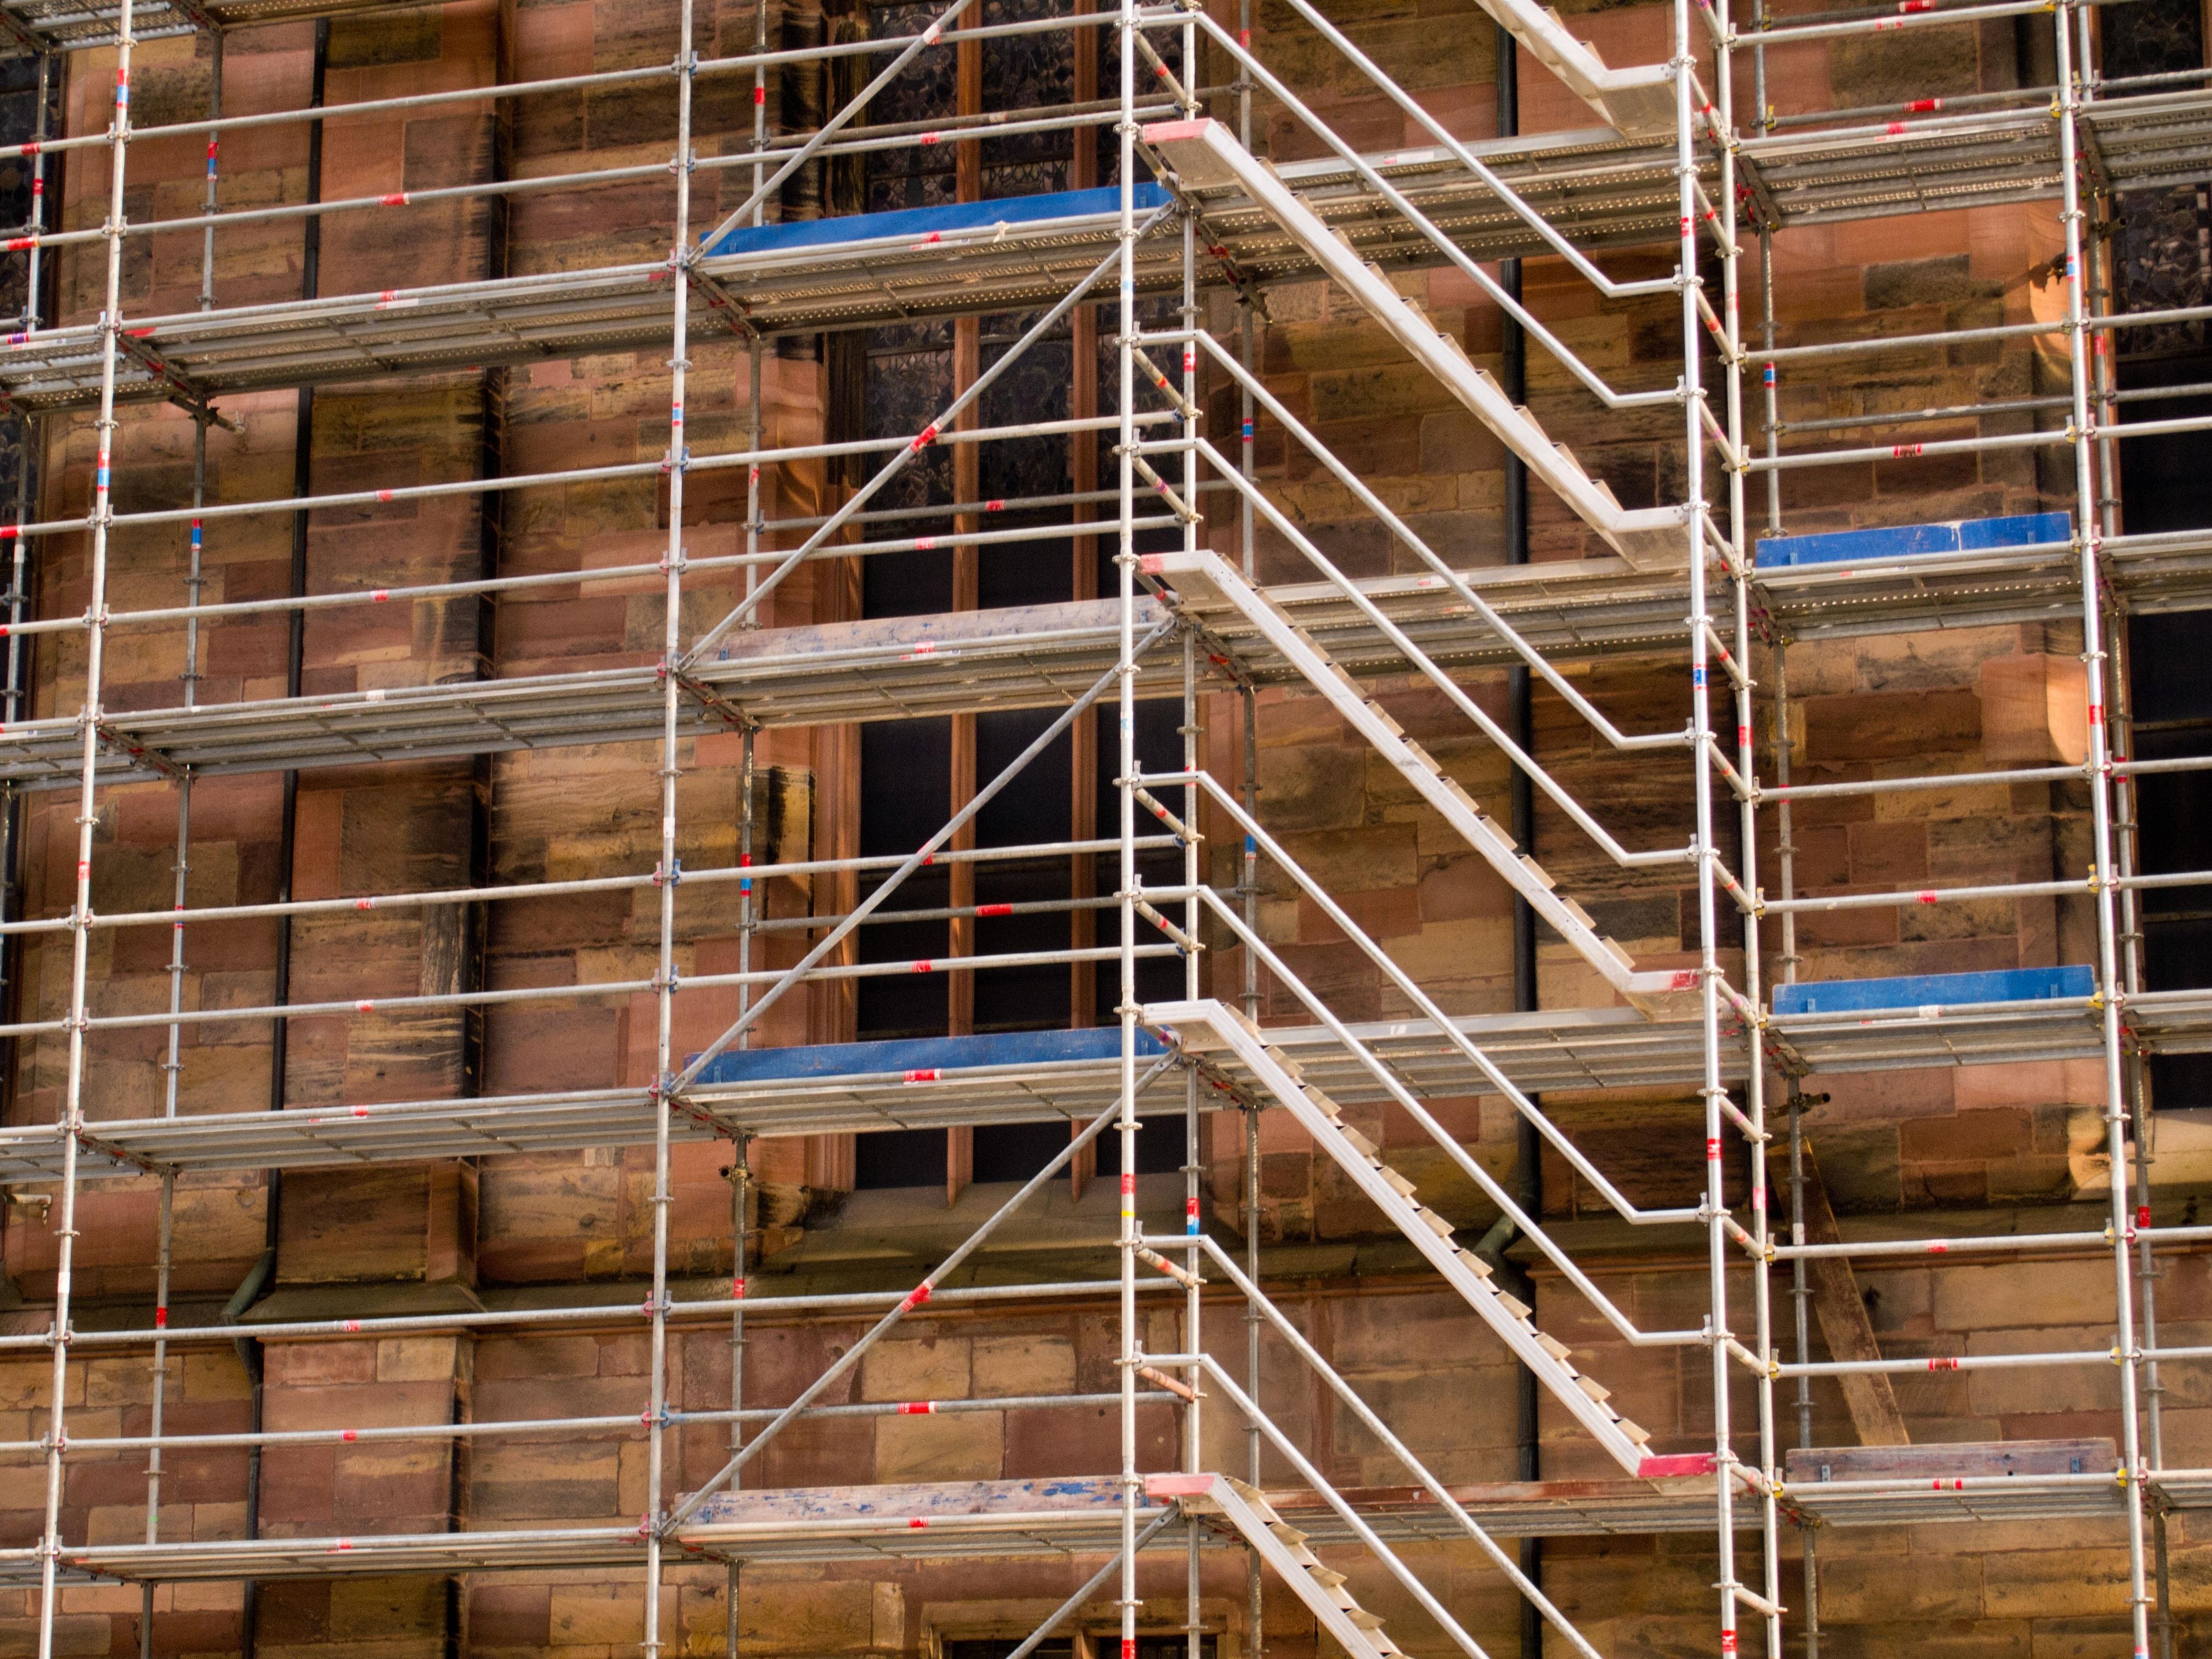 Free Images wood floor building wall facade brick interior